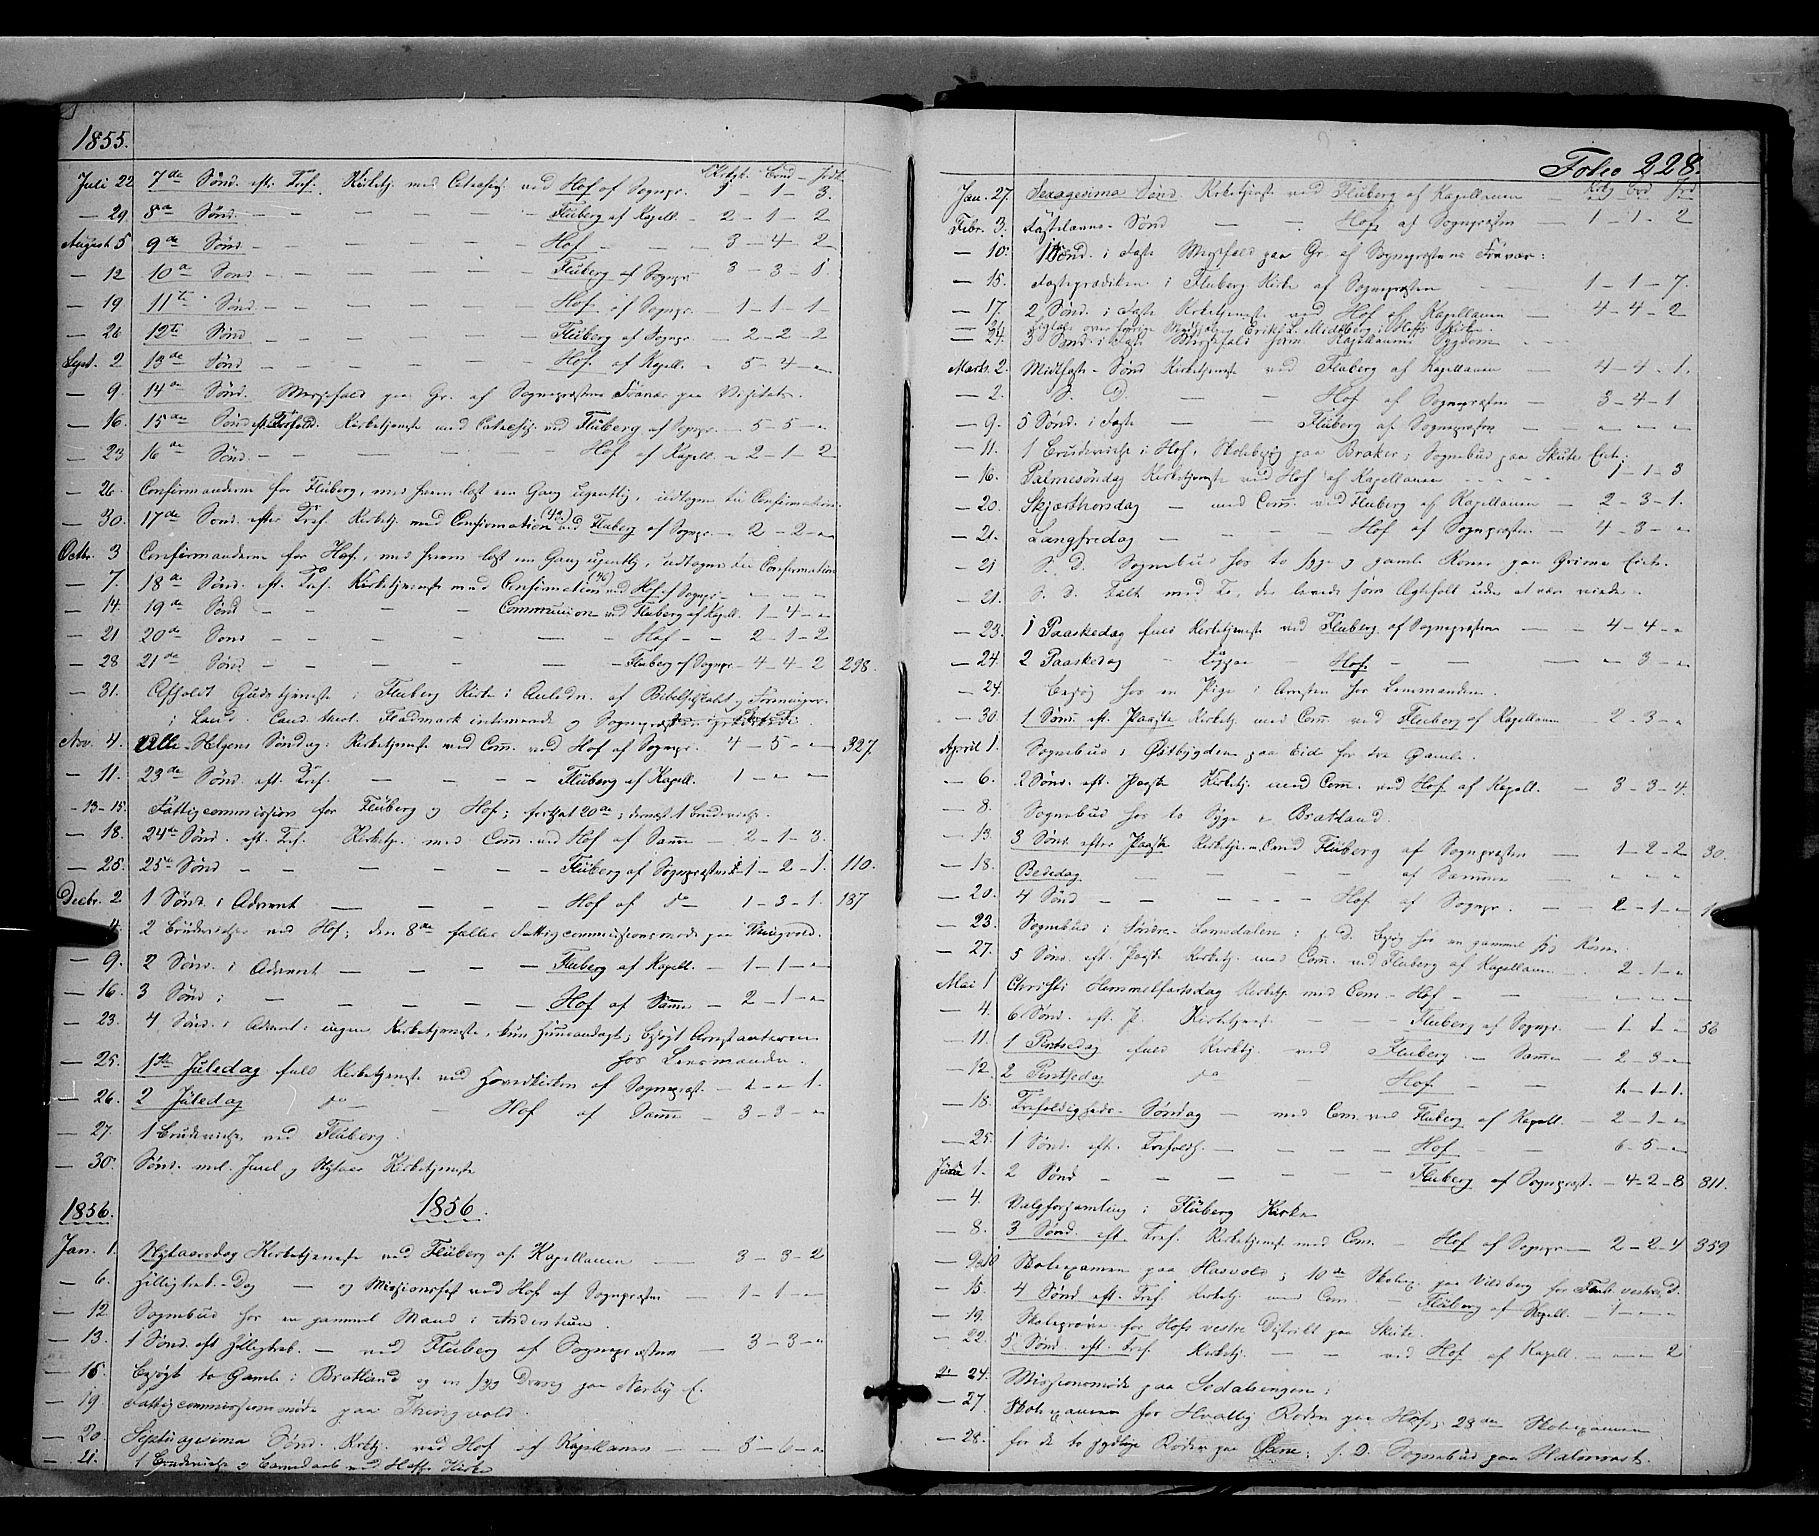 SAH, Land prestekontor, Ministerialbok nr. 9, 1847-1859, s. 228